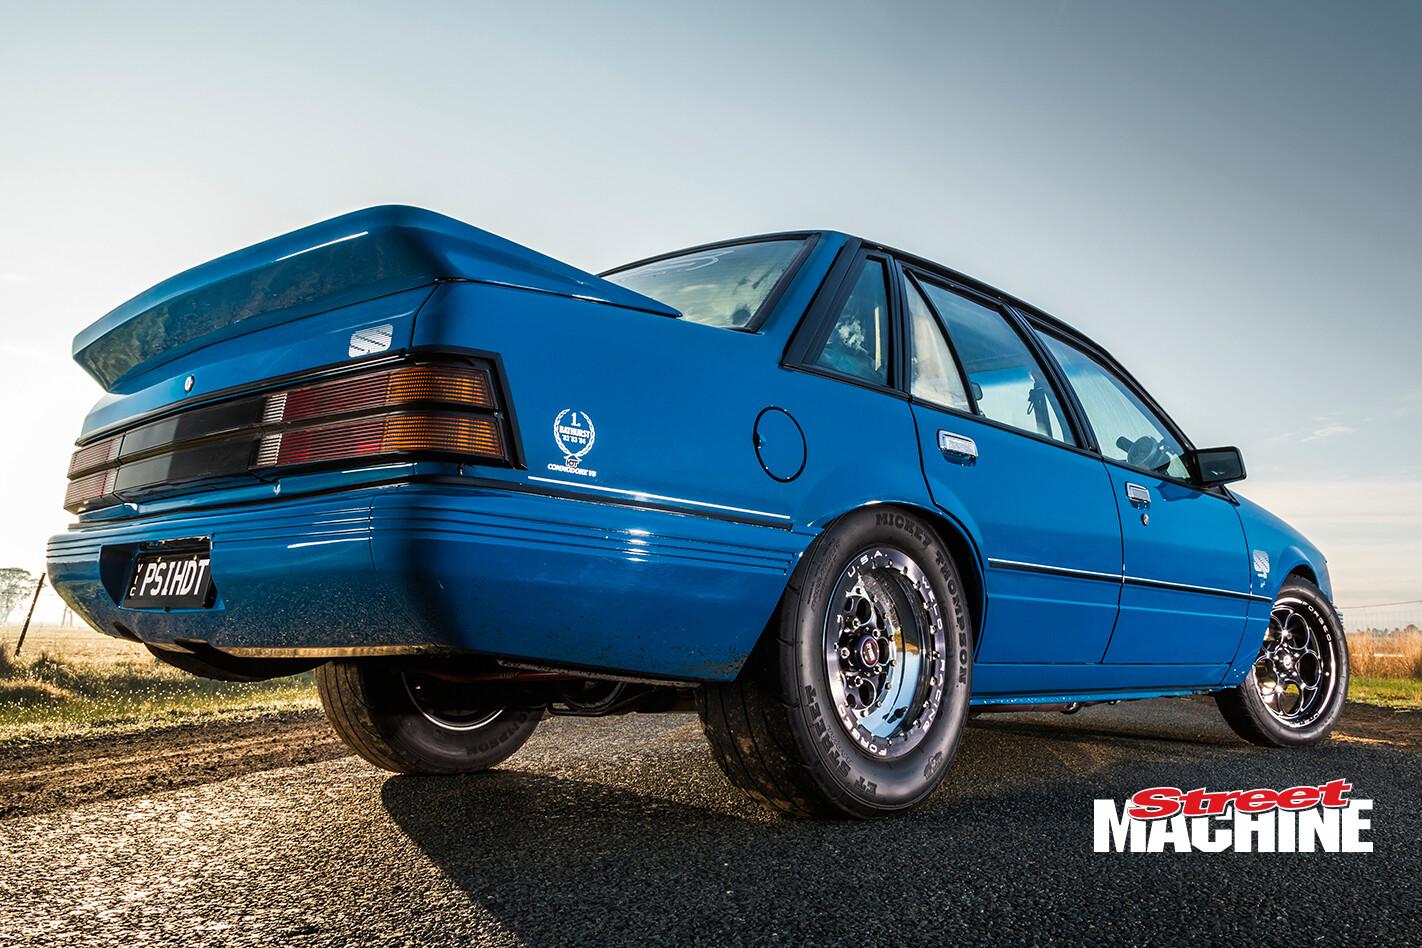 Holden VK Commodore HDT Brock Blue Meanie LSA 1